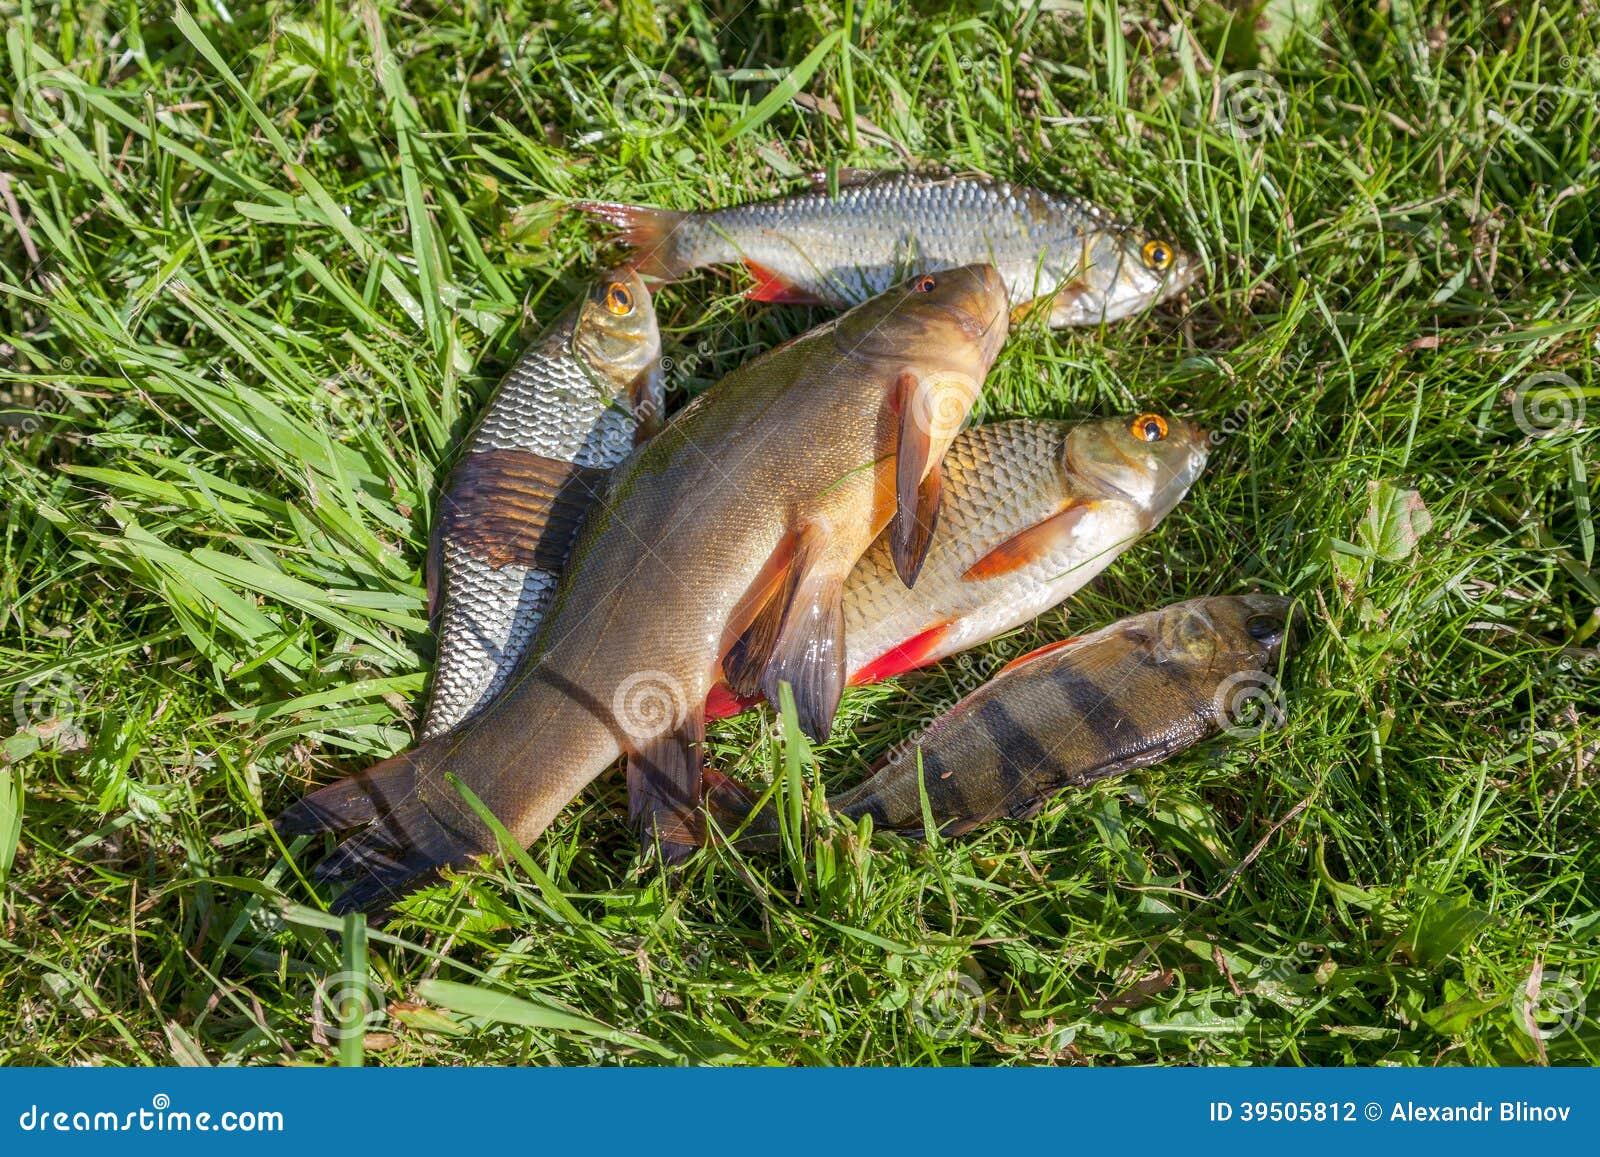 Freshly caught river fish